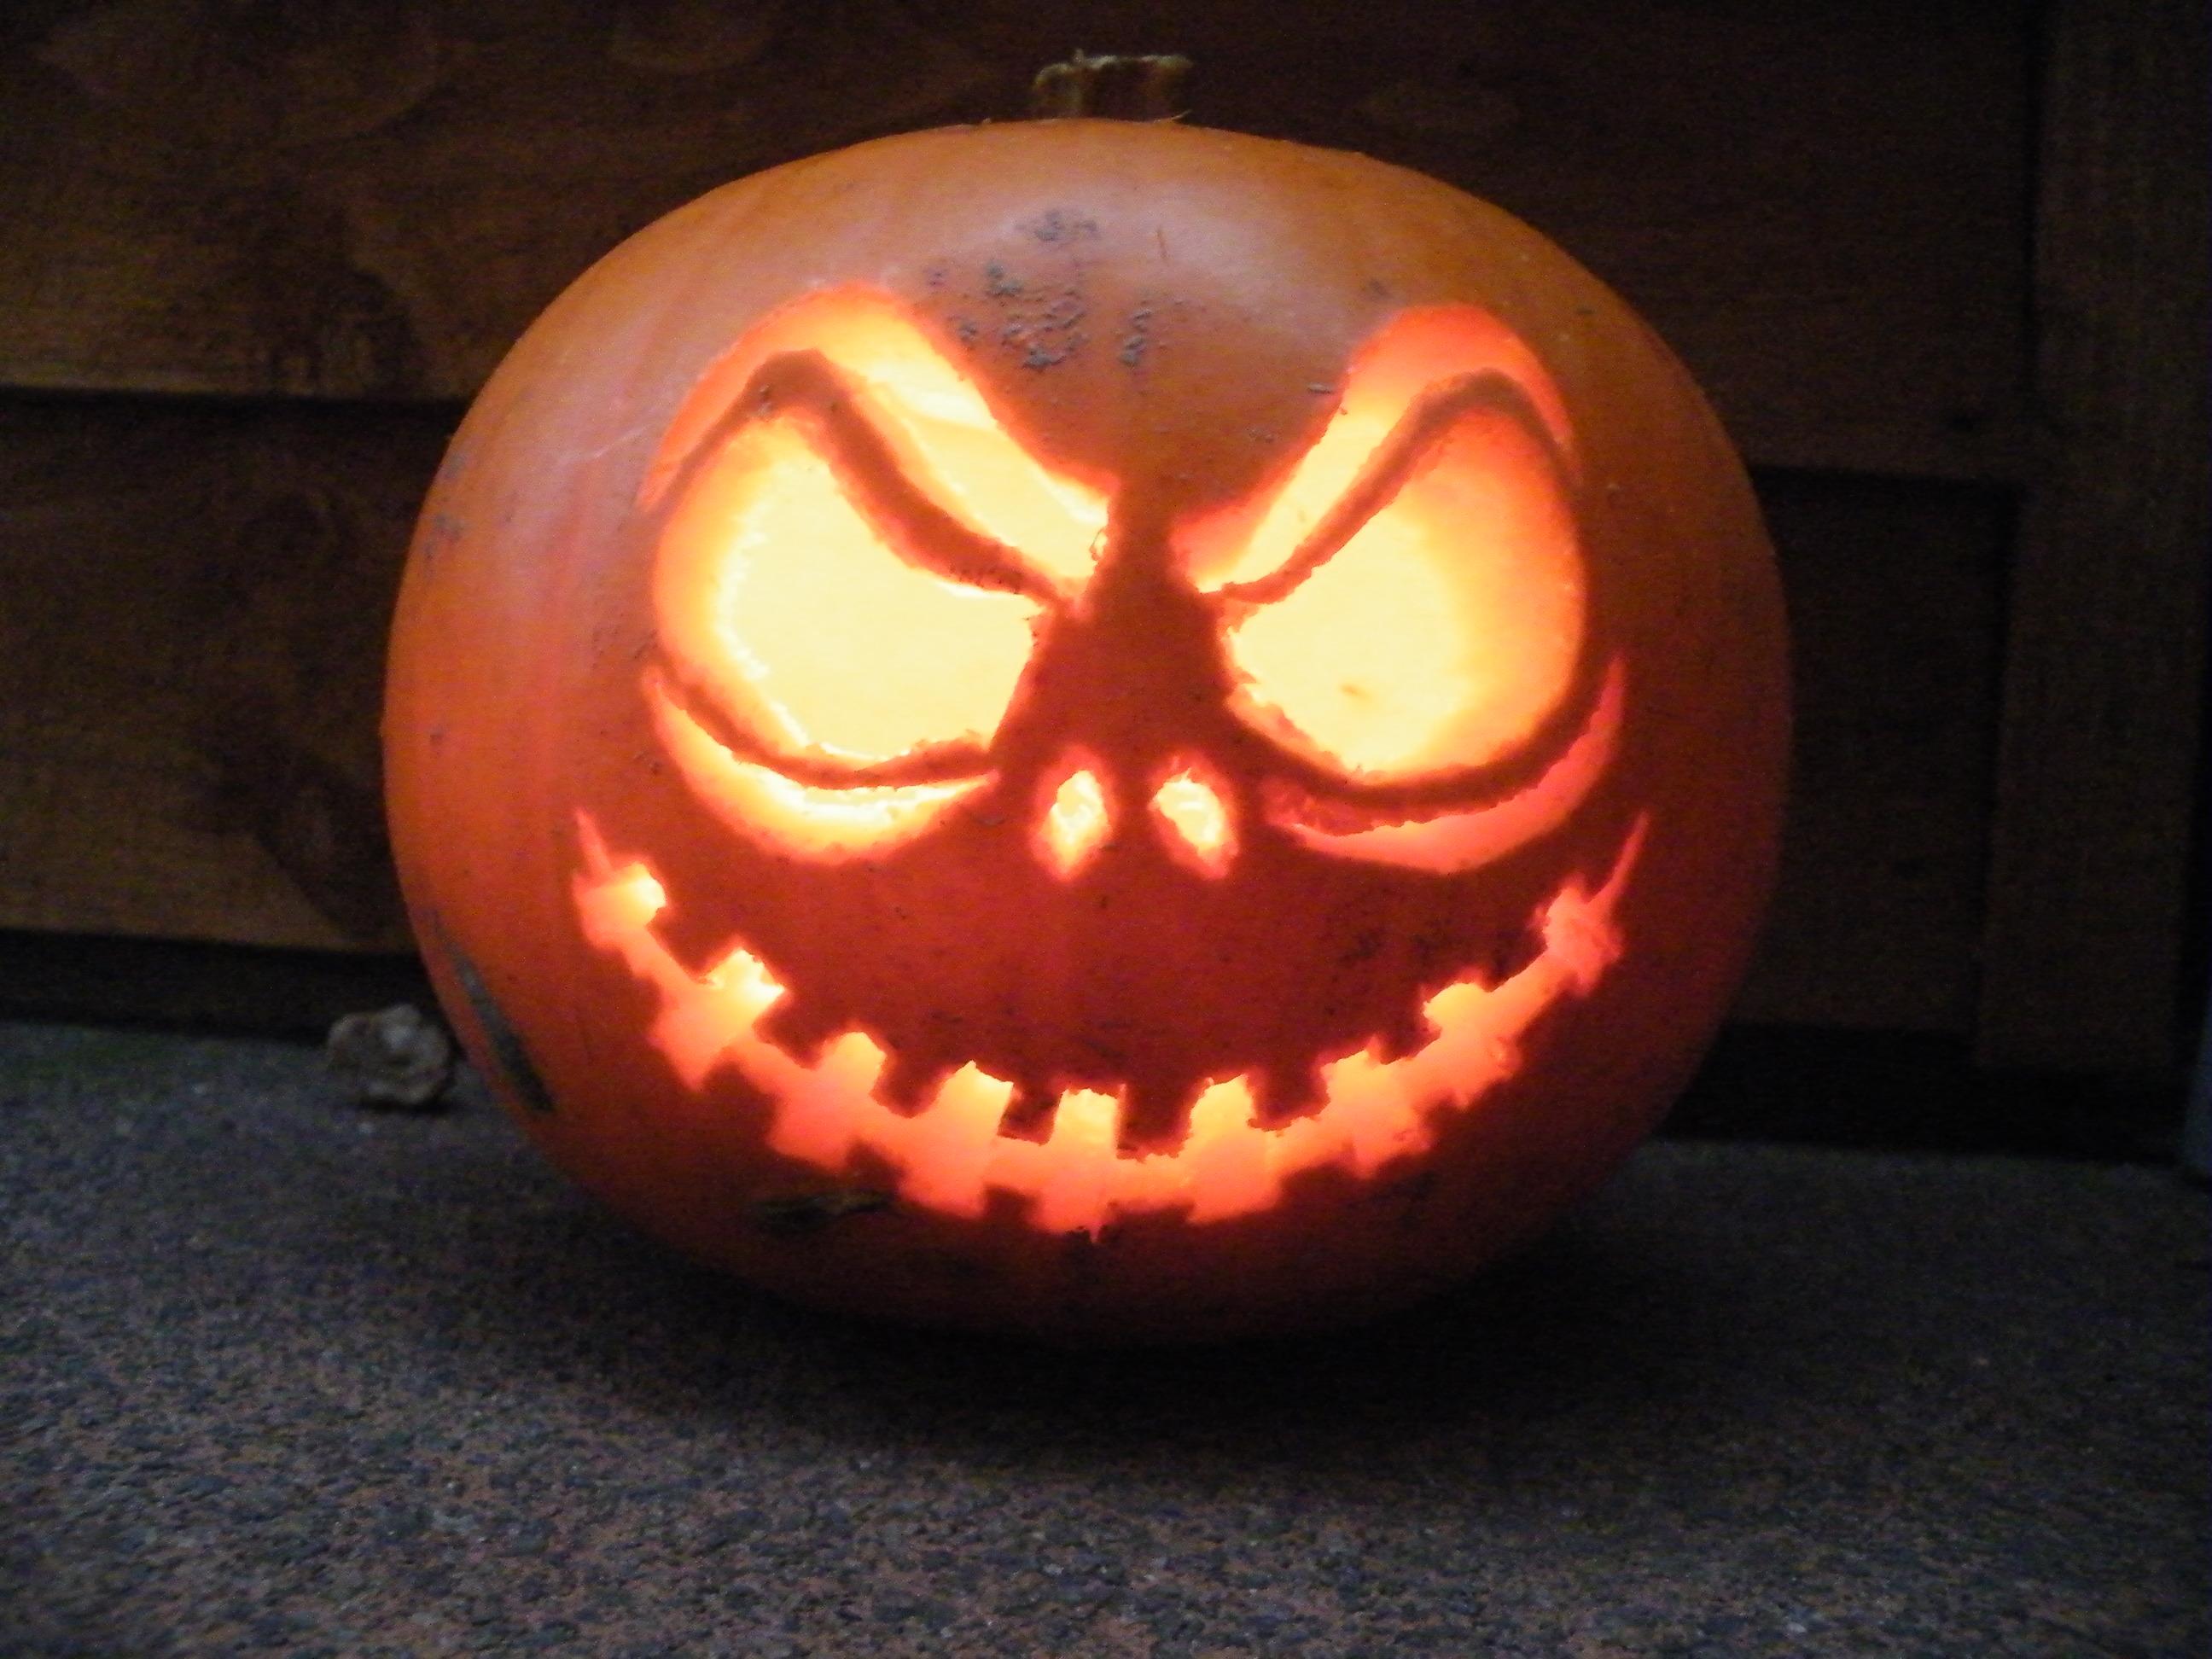 image about Jack Skellington Pumpkin Stencils Free Printable titled Jack Skellington Pumpkin (with Images)